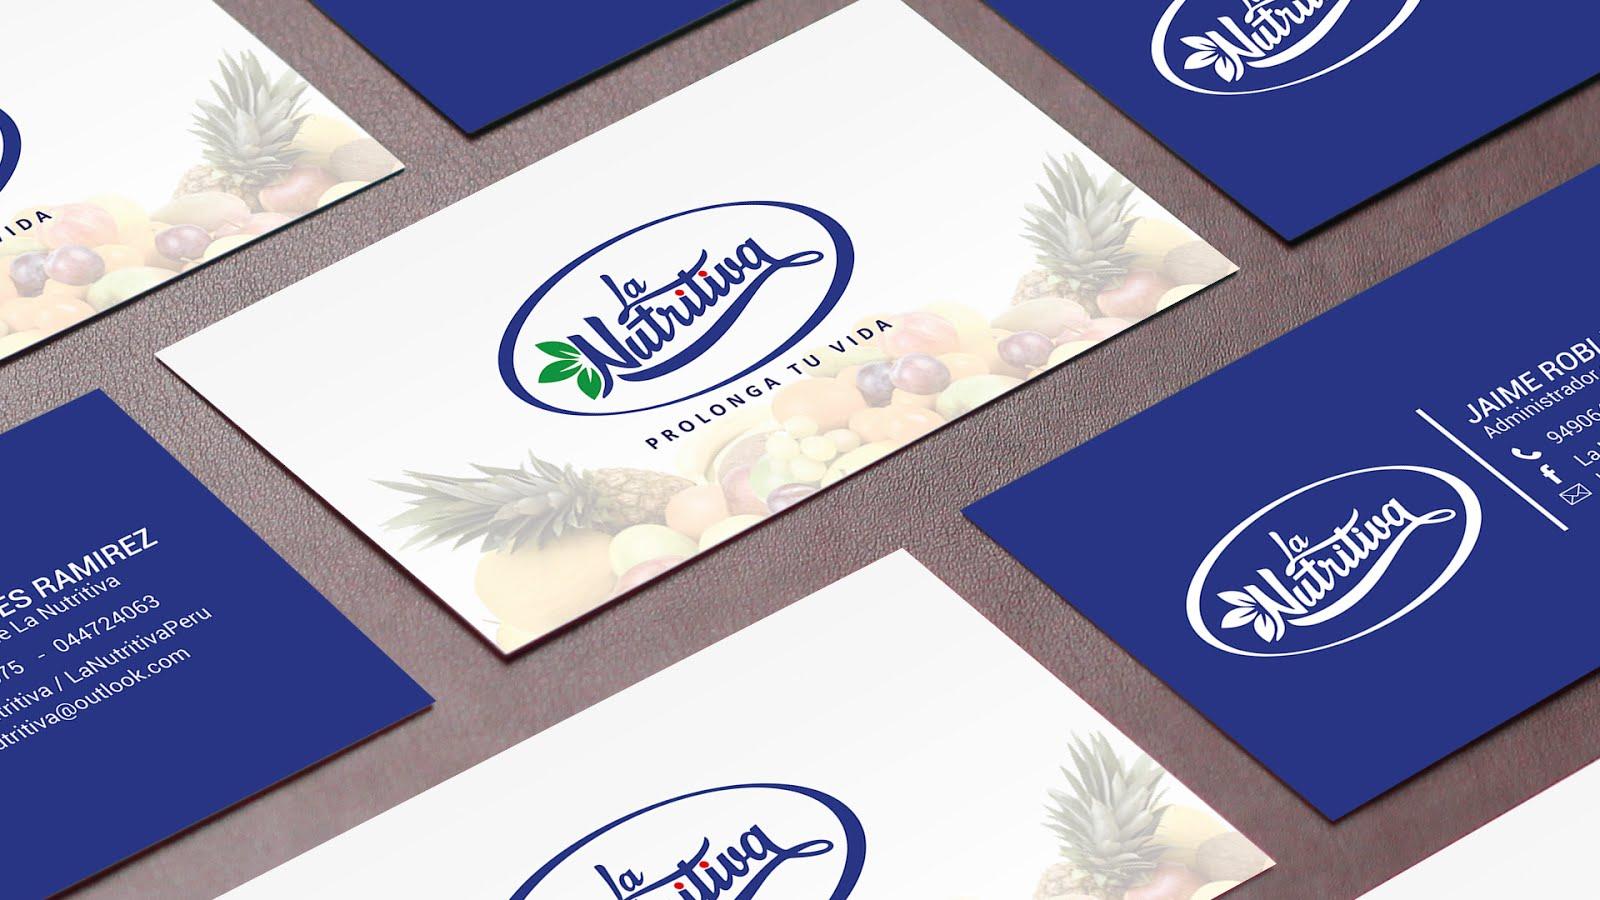 Tarjetas Personales La Nutritiva